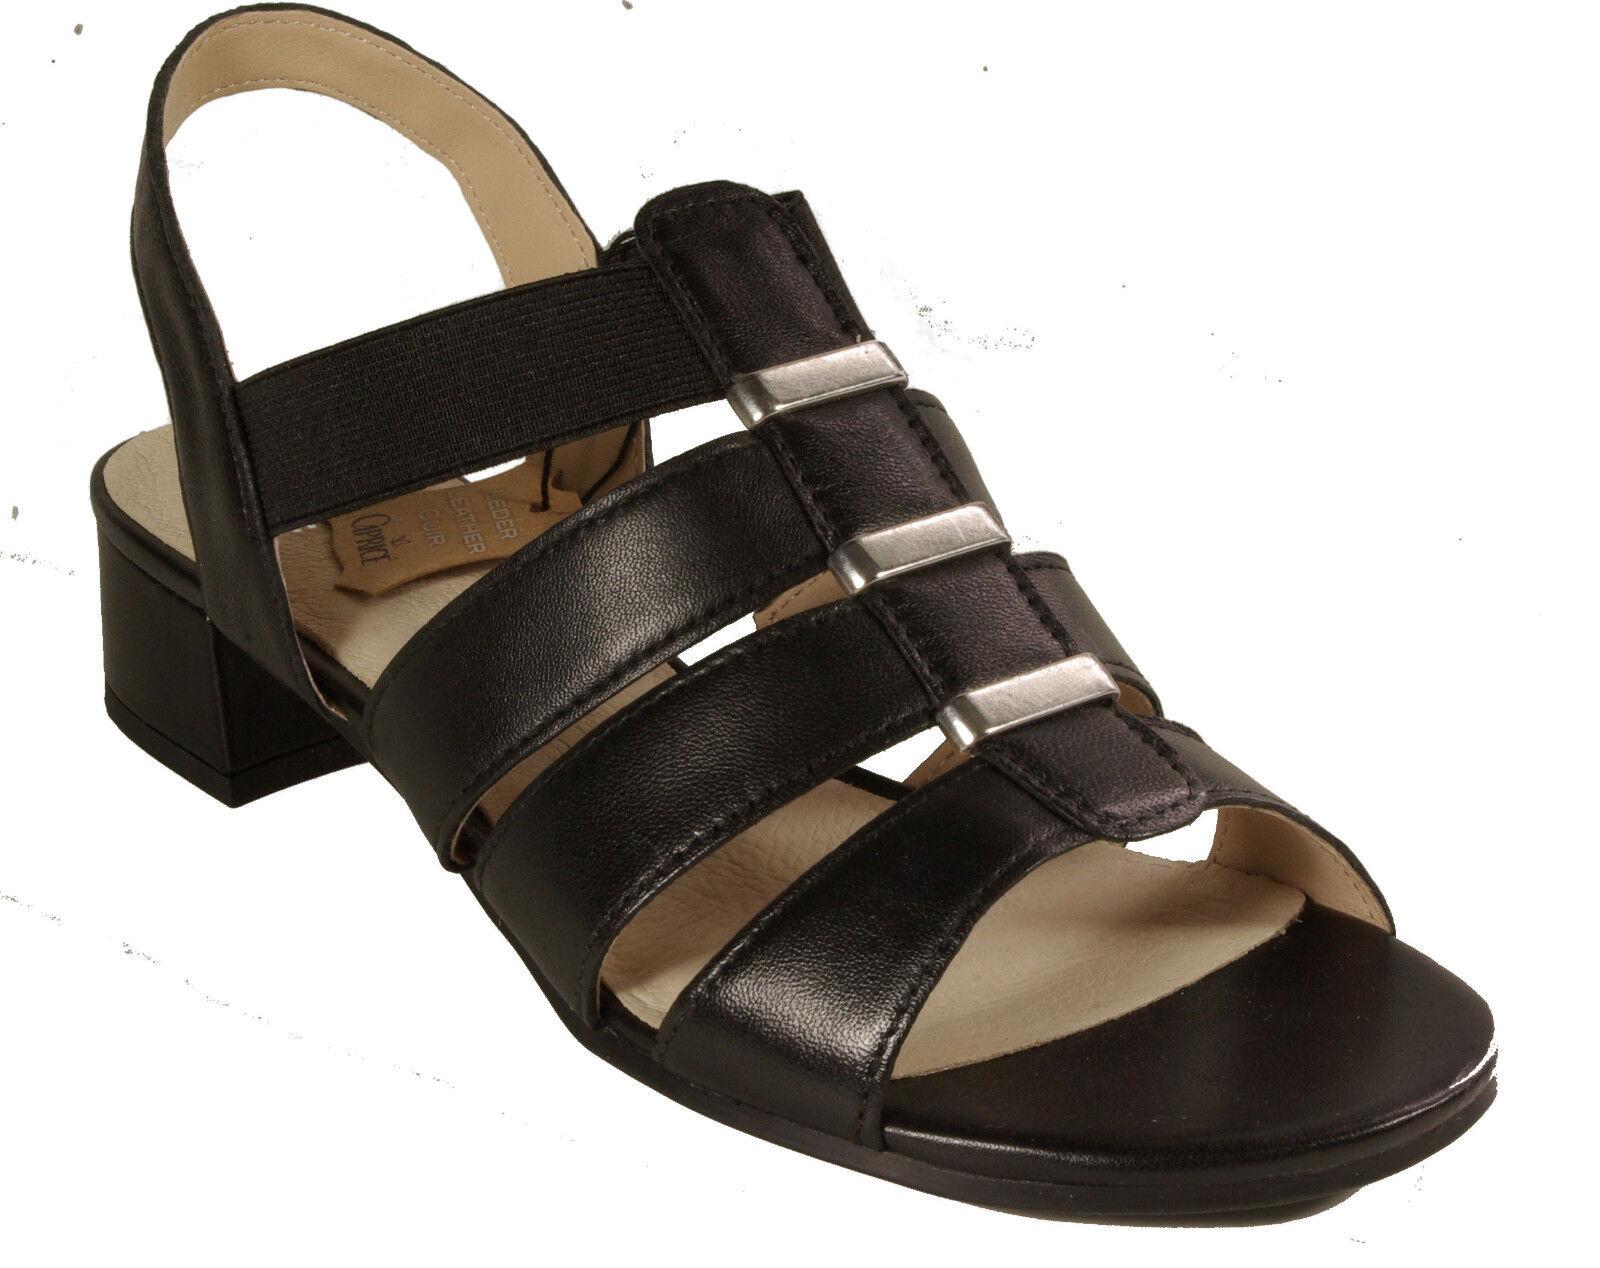 CAPRICE Schuhe Sandale Sandaleetten schwarz echt Leder NEU